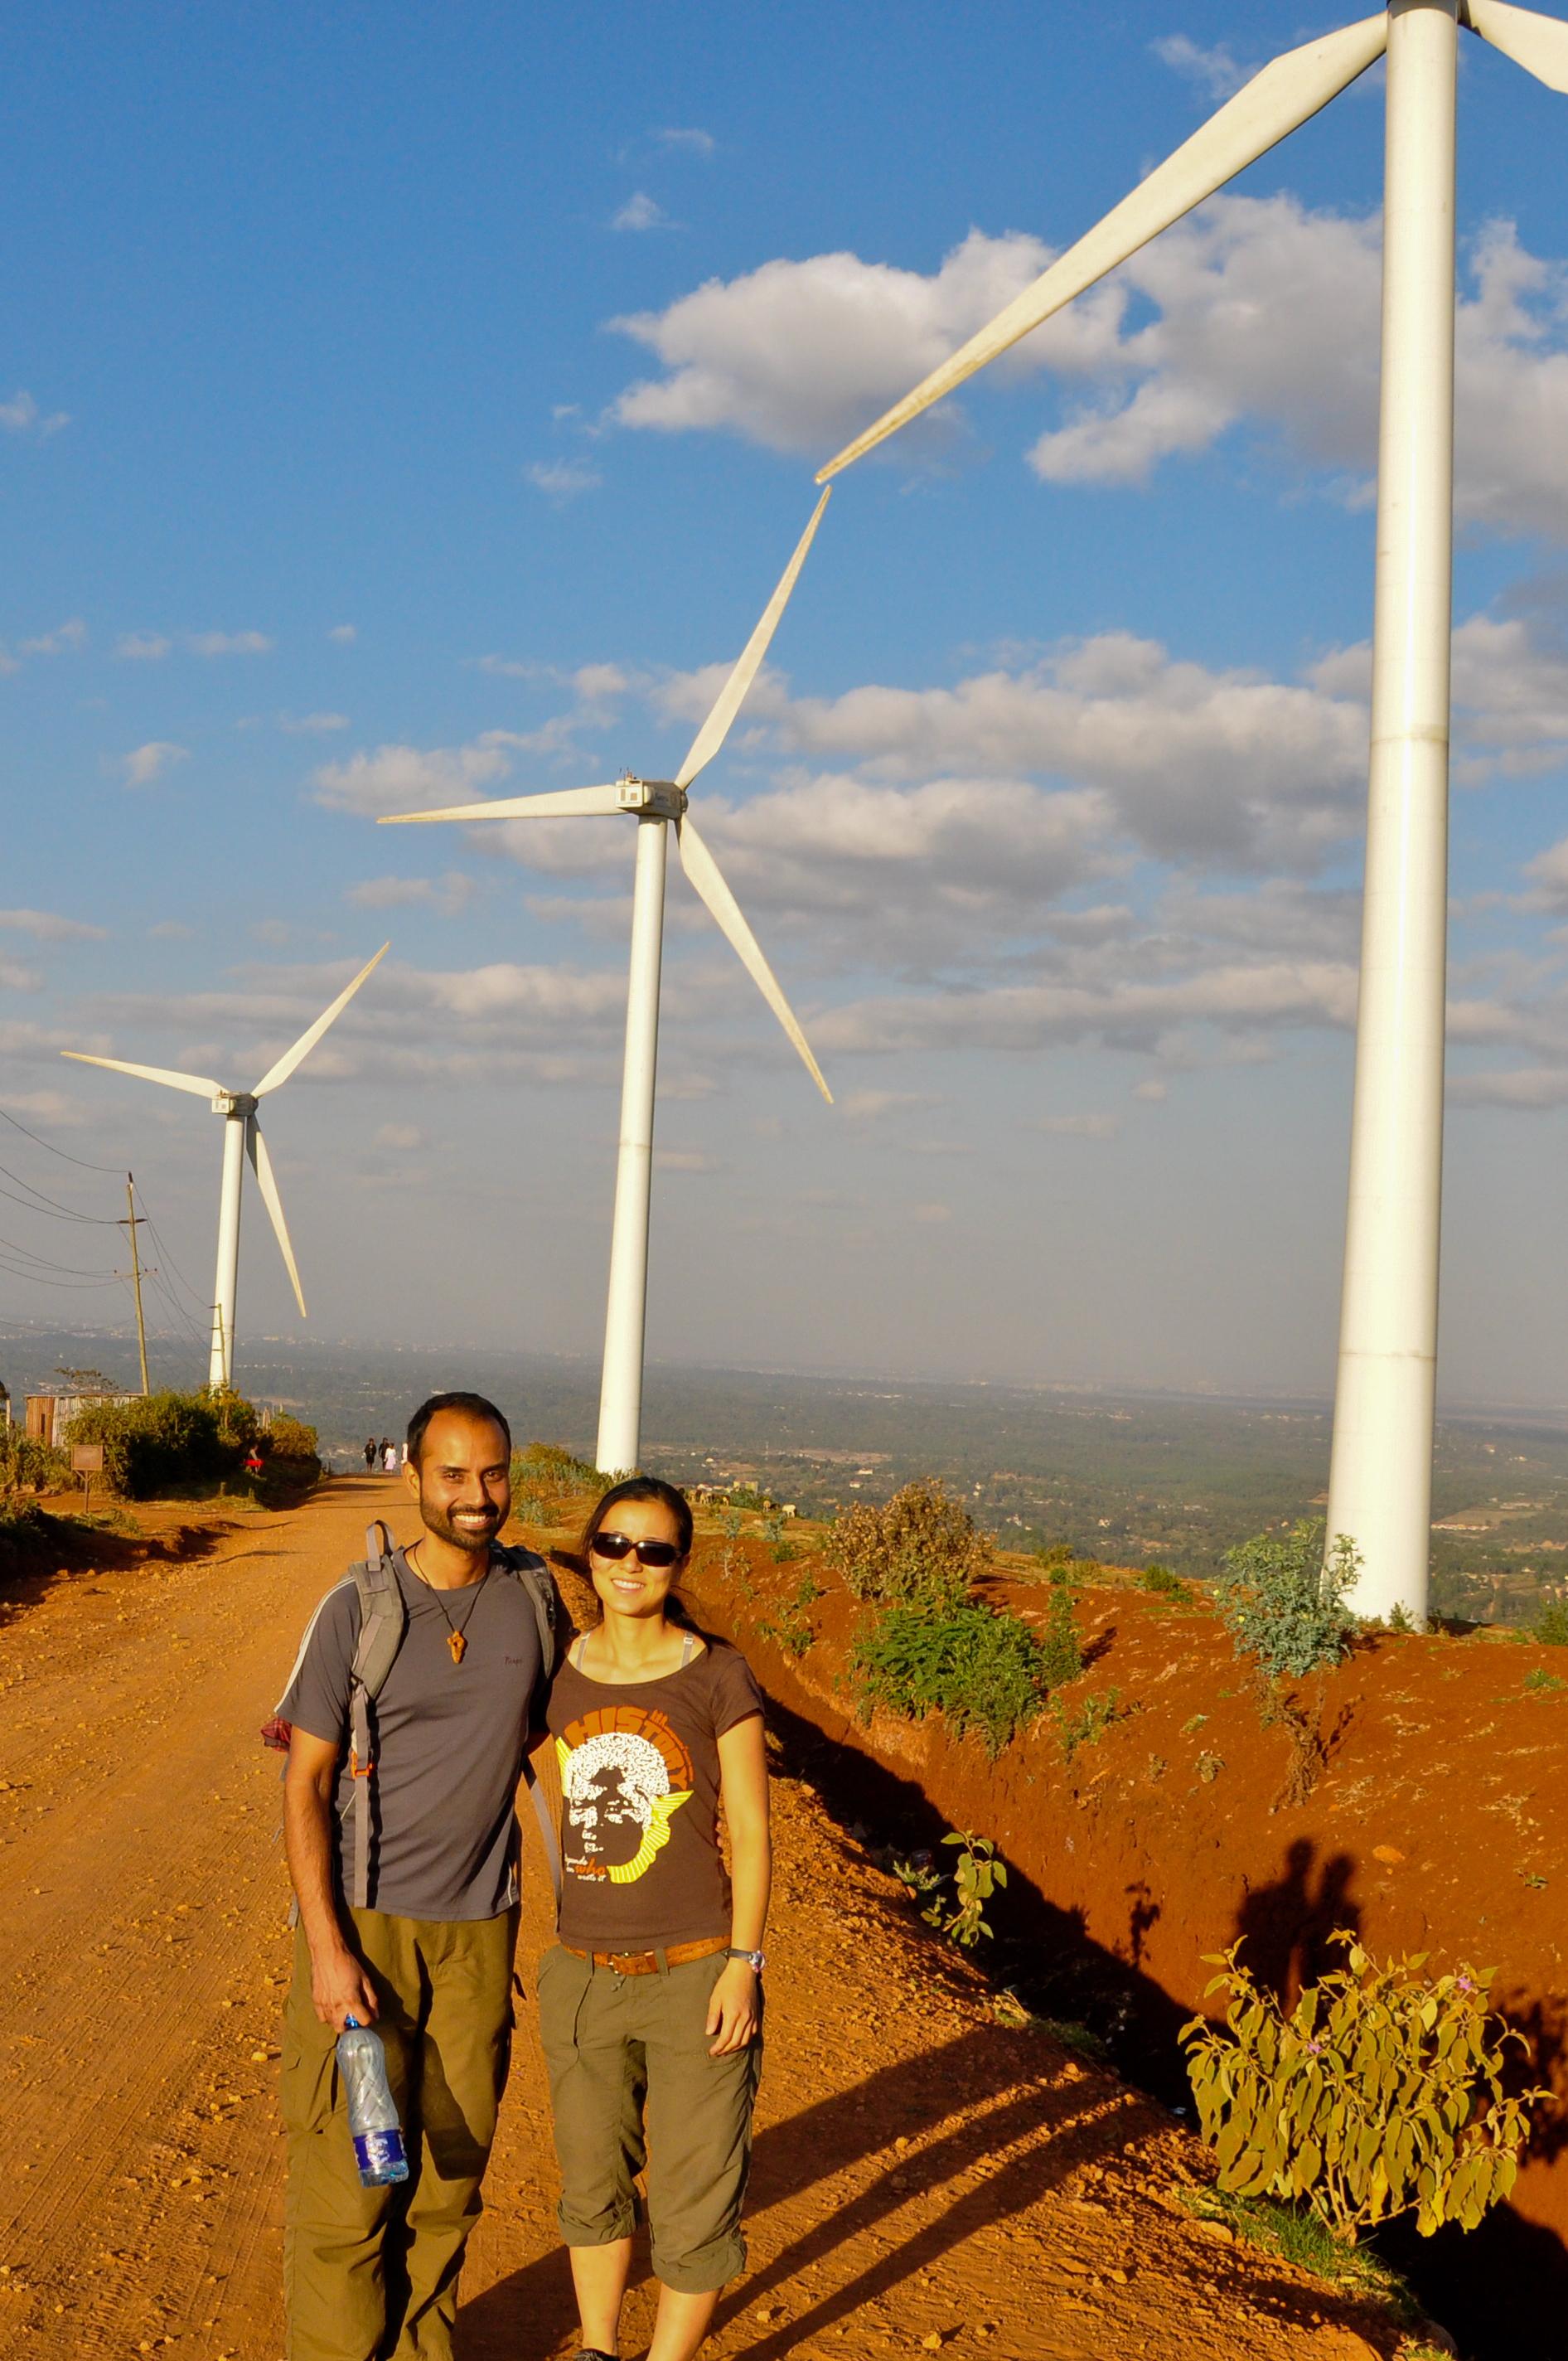 Berkeley Lab scientists Ranjit Deshmukh and Grace Wu at Ngong Hills Wind Farm (Courtesy Grace Wu)